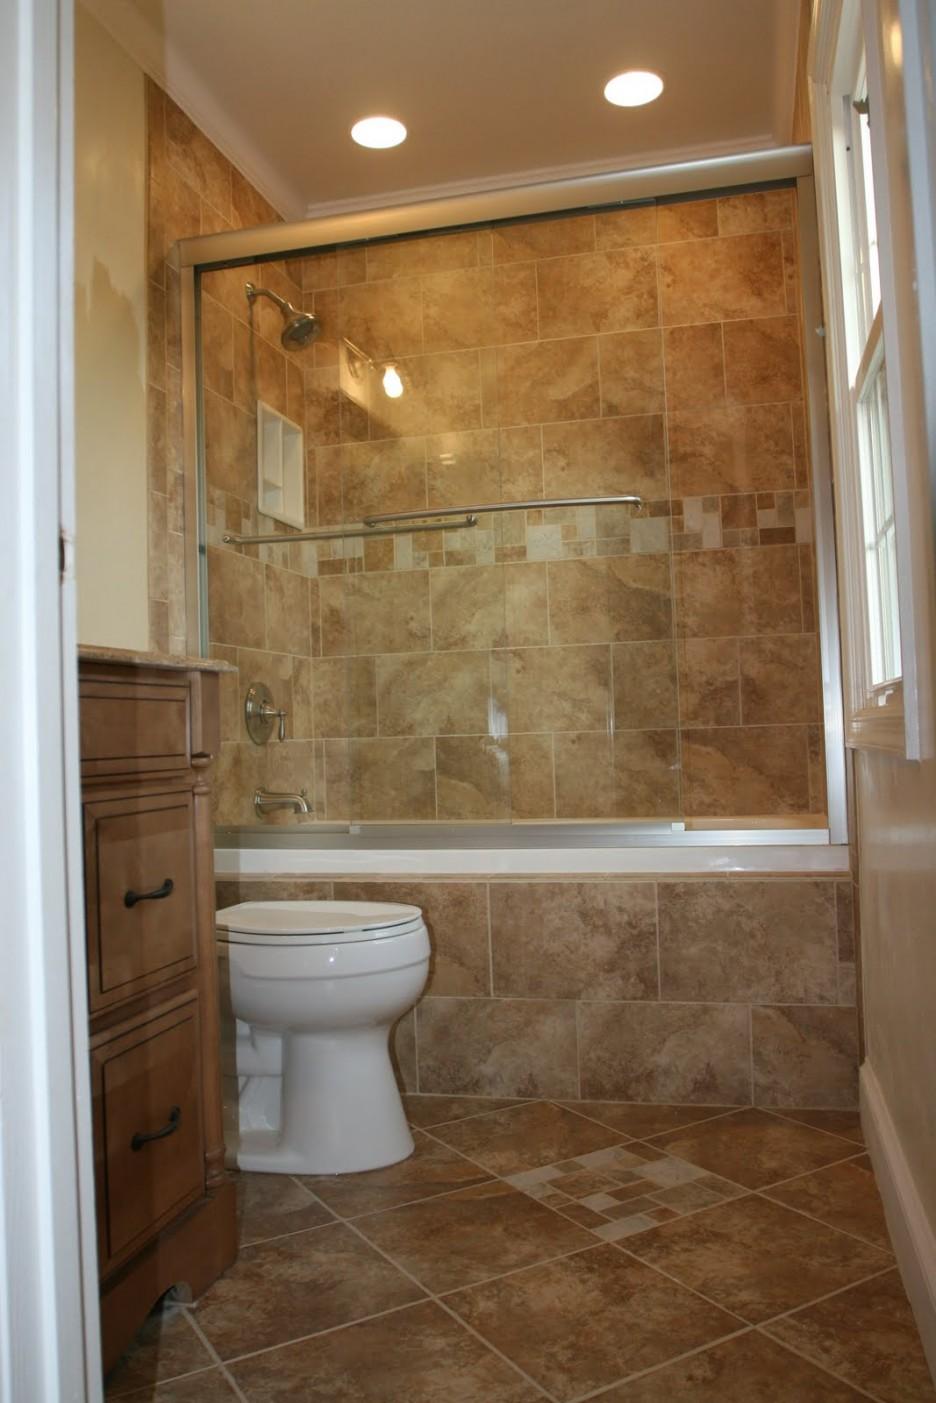 Luxurious Toilets Interior Design Ideas | Home Decorating Ideas